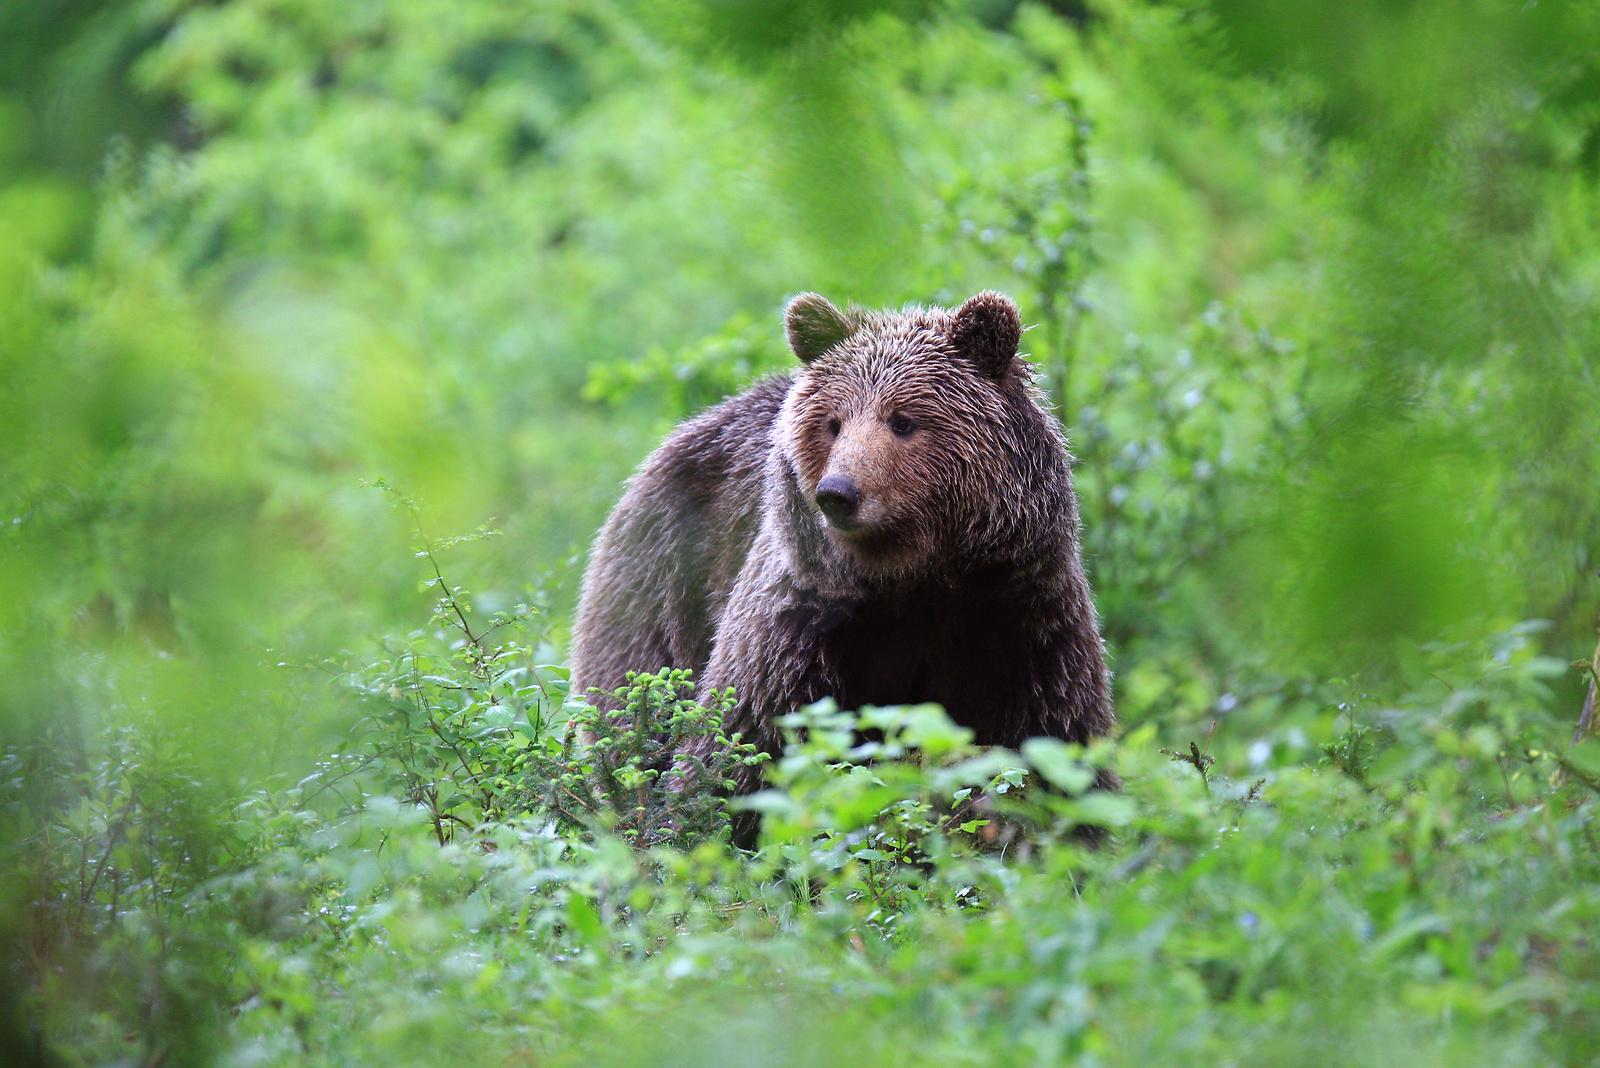 Observar sigilosamente un oso pardo